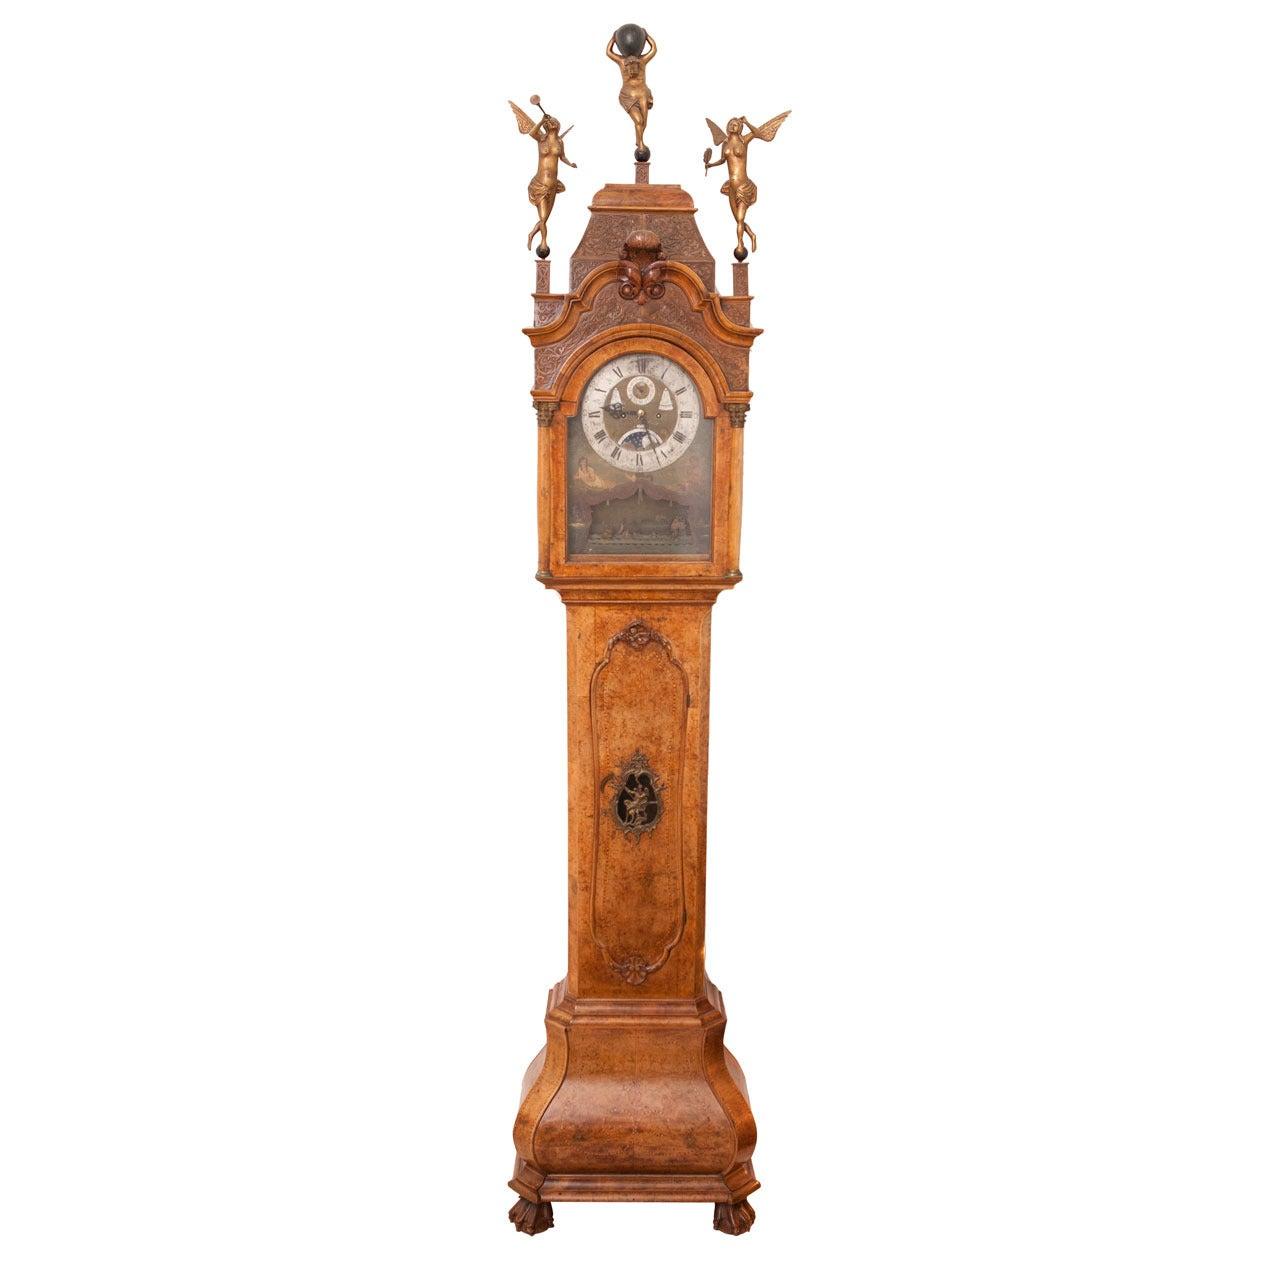 Tall Case Amsterdam Clock, Signed Pieter Verlaer, circa 1840-1860